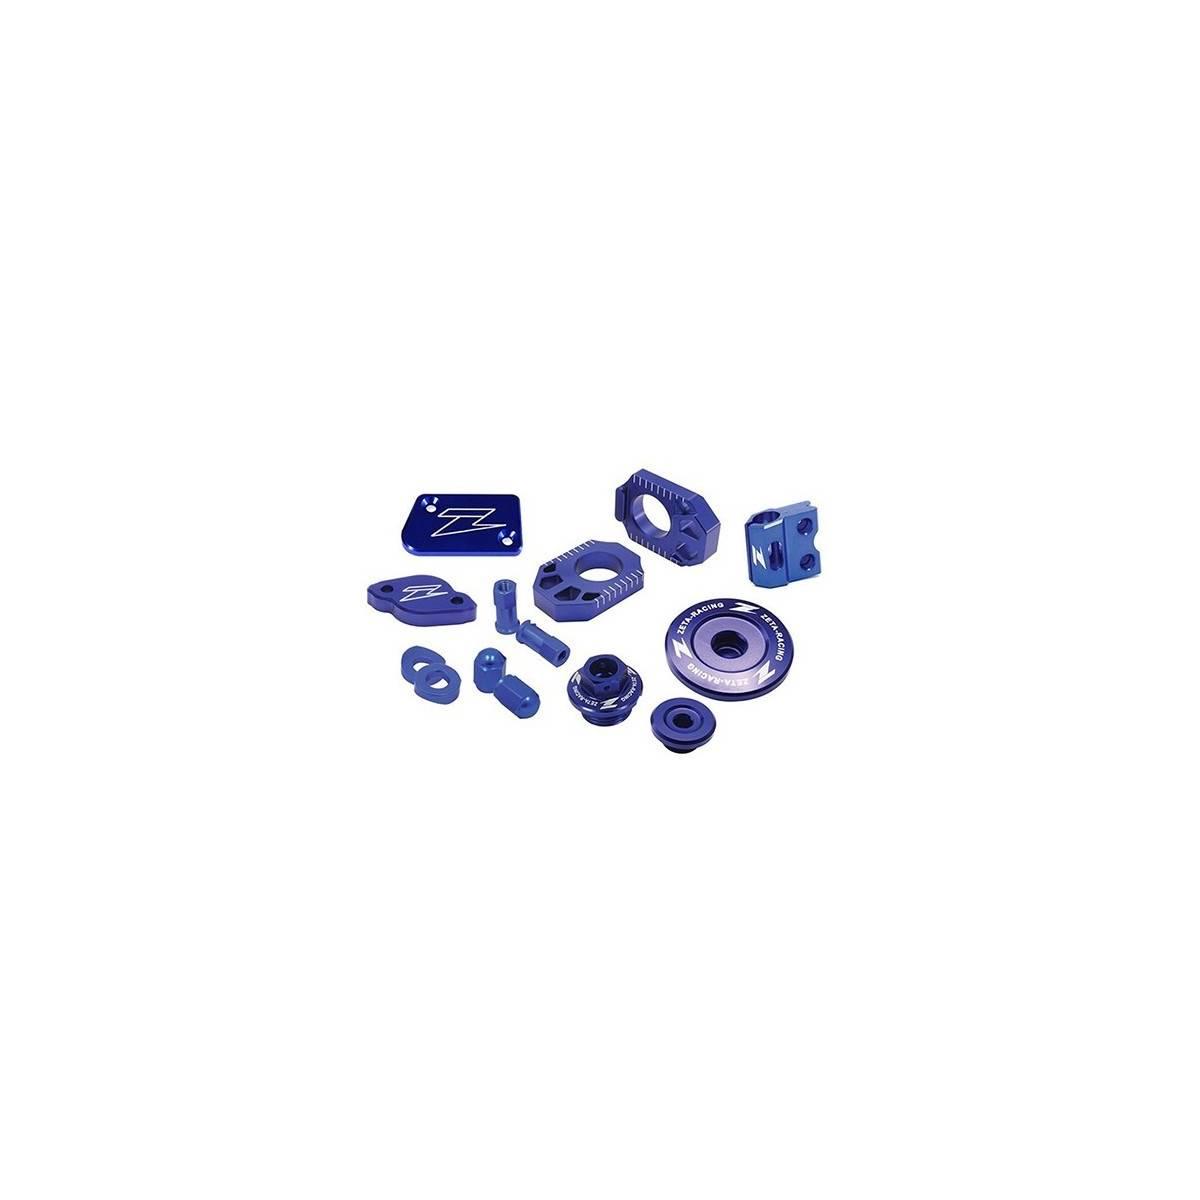 ZE51.2146 - Kit Completo Kawasaki Kx250F´17-, 450F´15- Azul